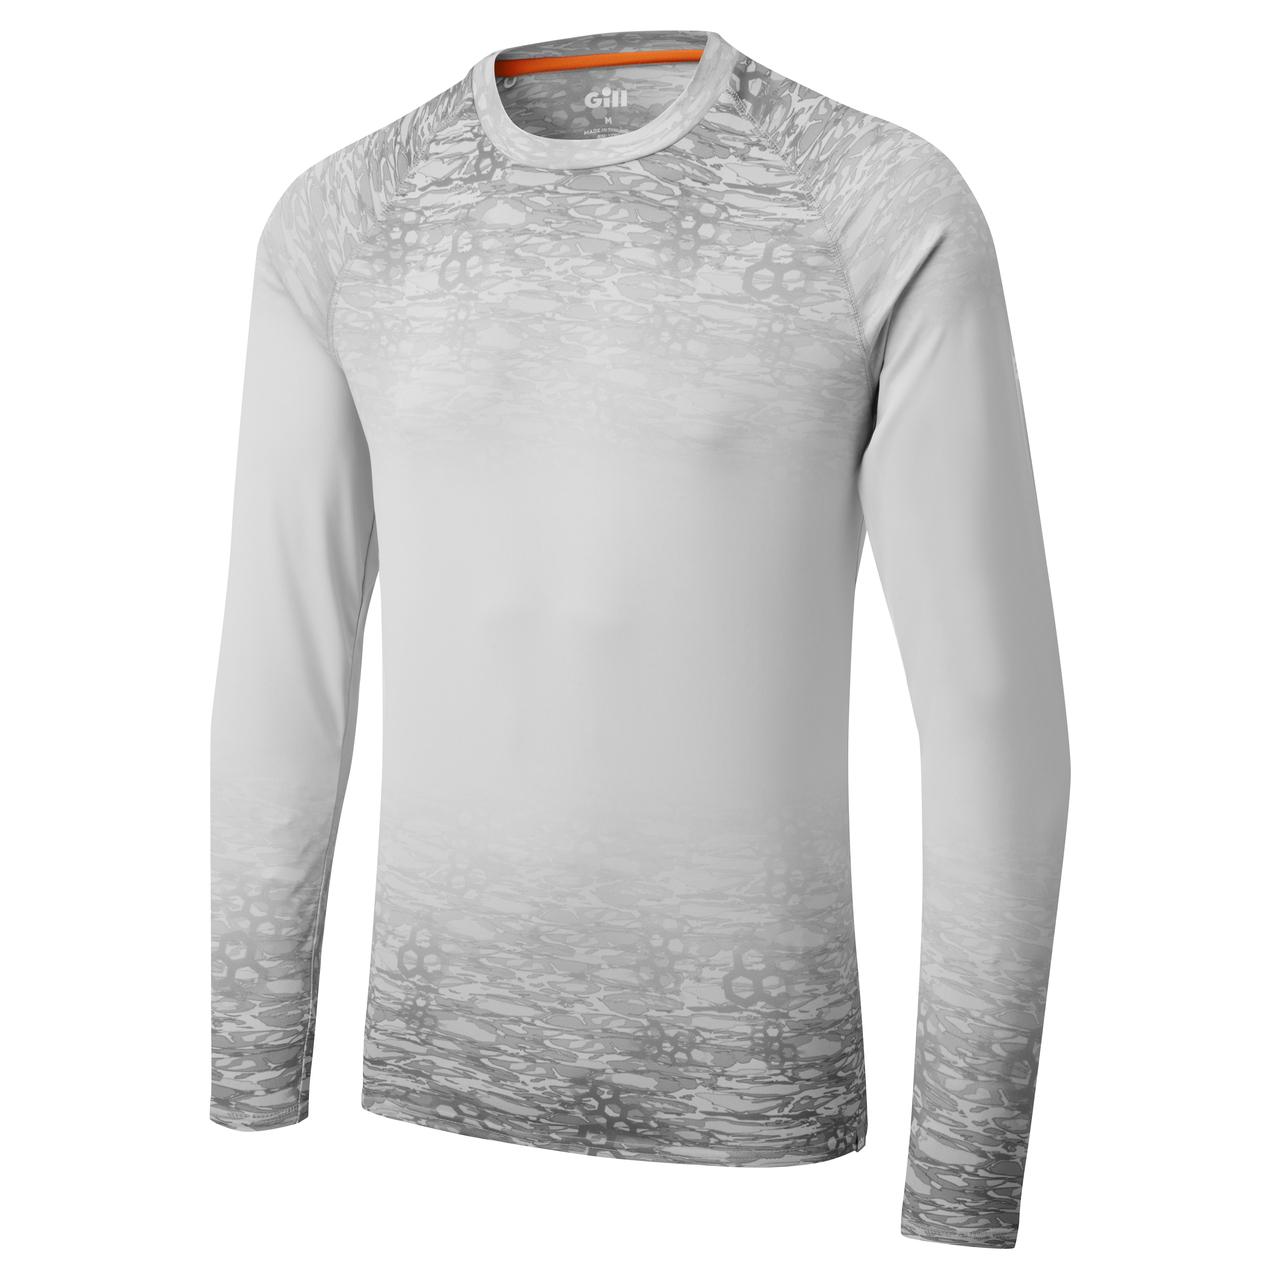 Men's UV Tec Tee - Long Sleeve - UV011-ICE01-2.jpg